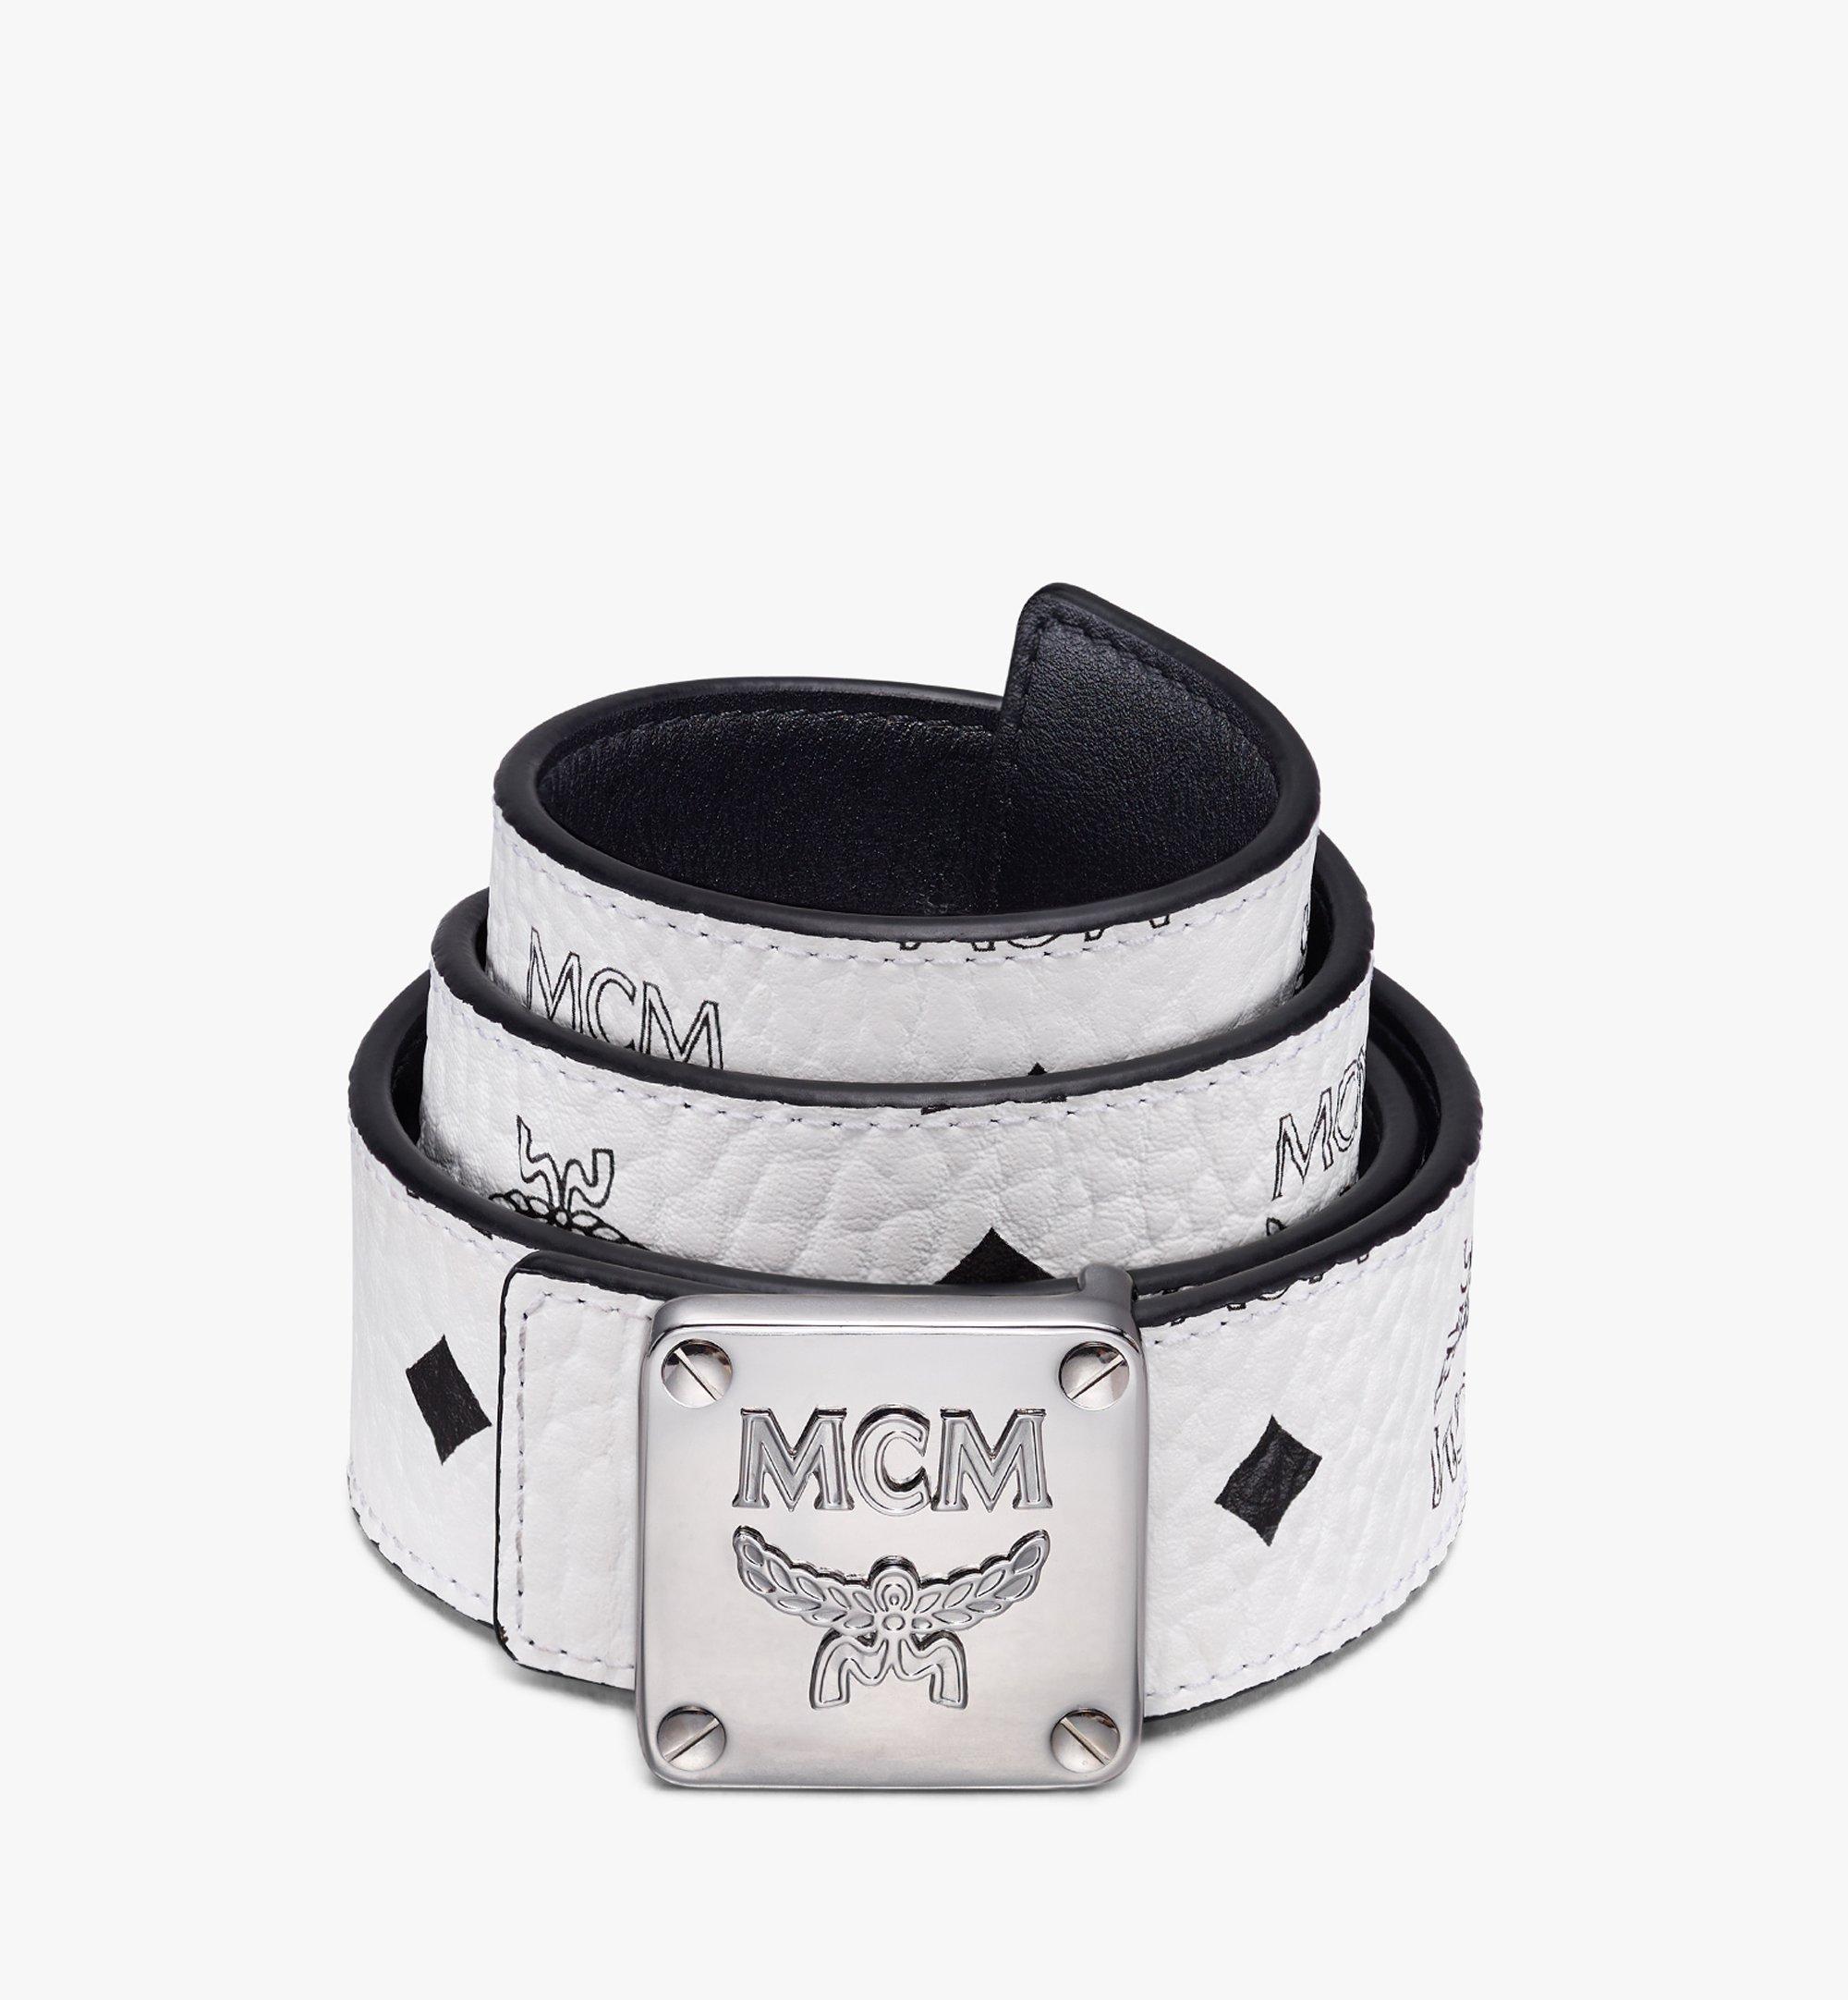 "MCM MCM Collection Reversible Belt 1.5"" in Visetos White MYBASMM08WT001 Alternate View 1"